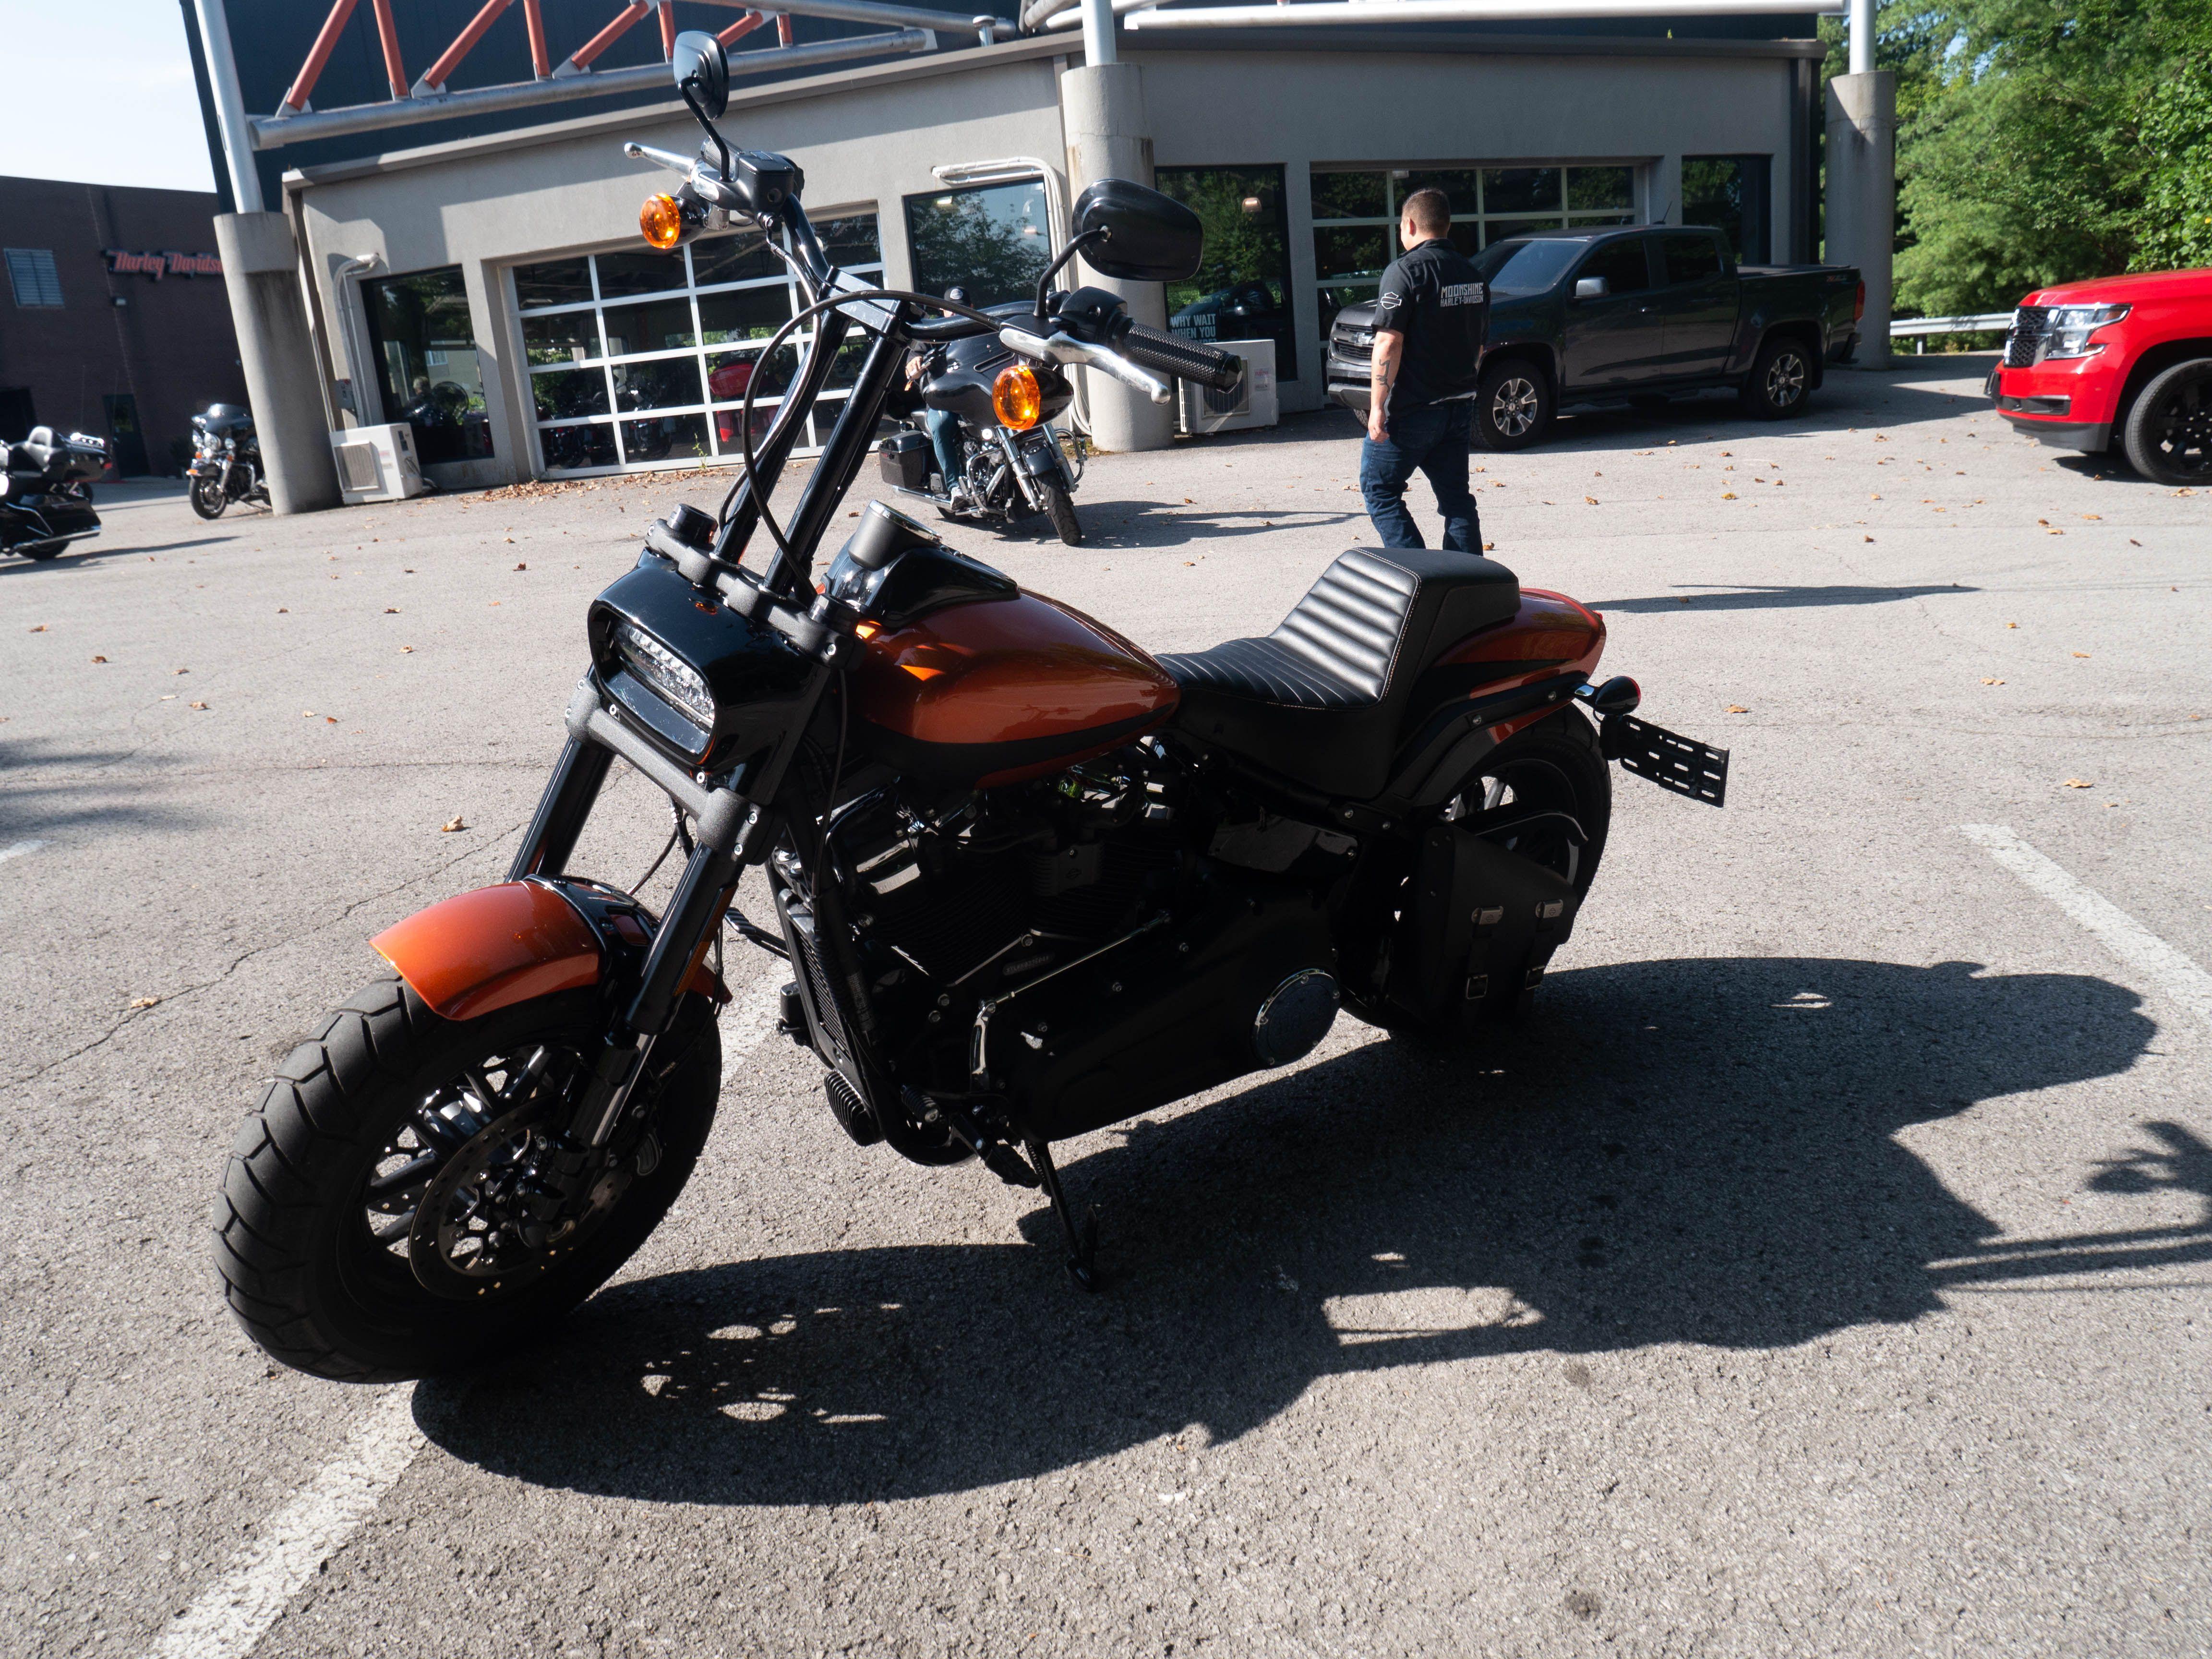 Pre-Owned 2019 Harley-Davidson Fat Bob 114